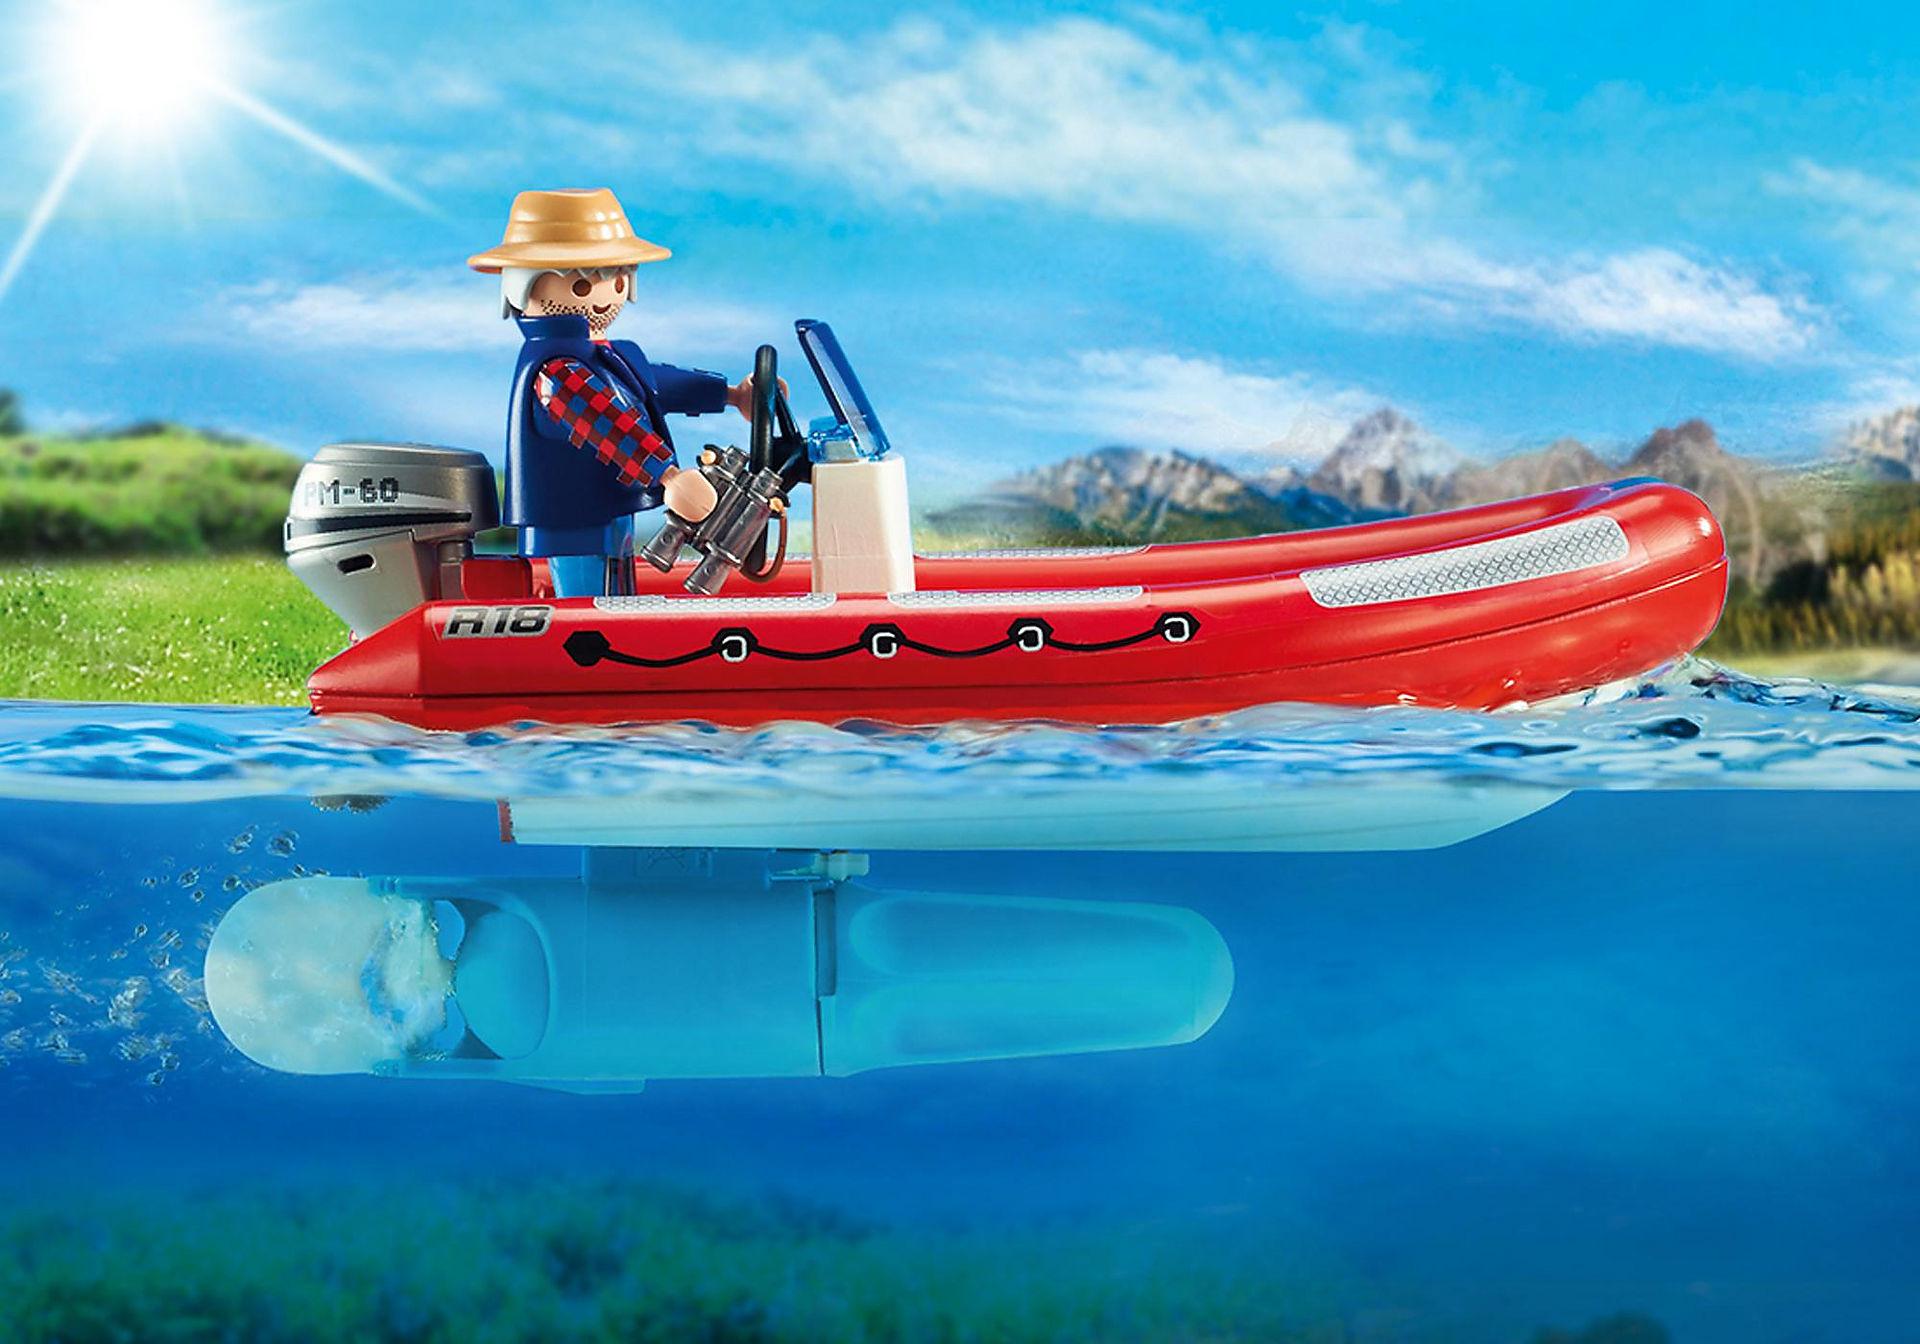 http://media.playmobil.com/i/playmobil/5559_product_extra1/Ponton z kłusownikami